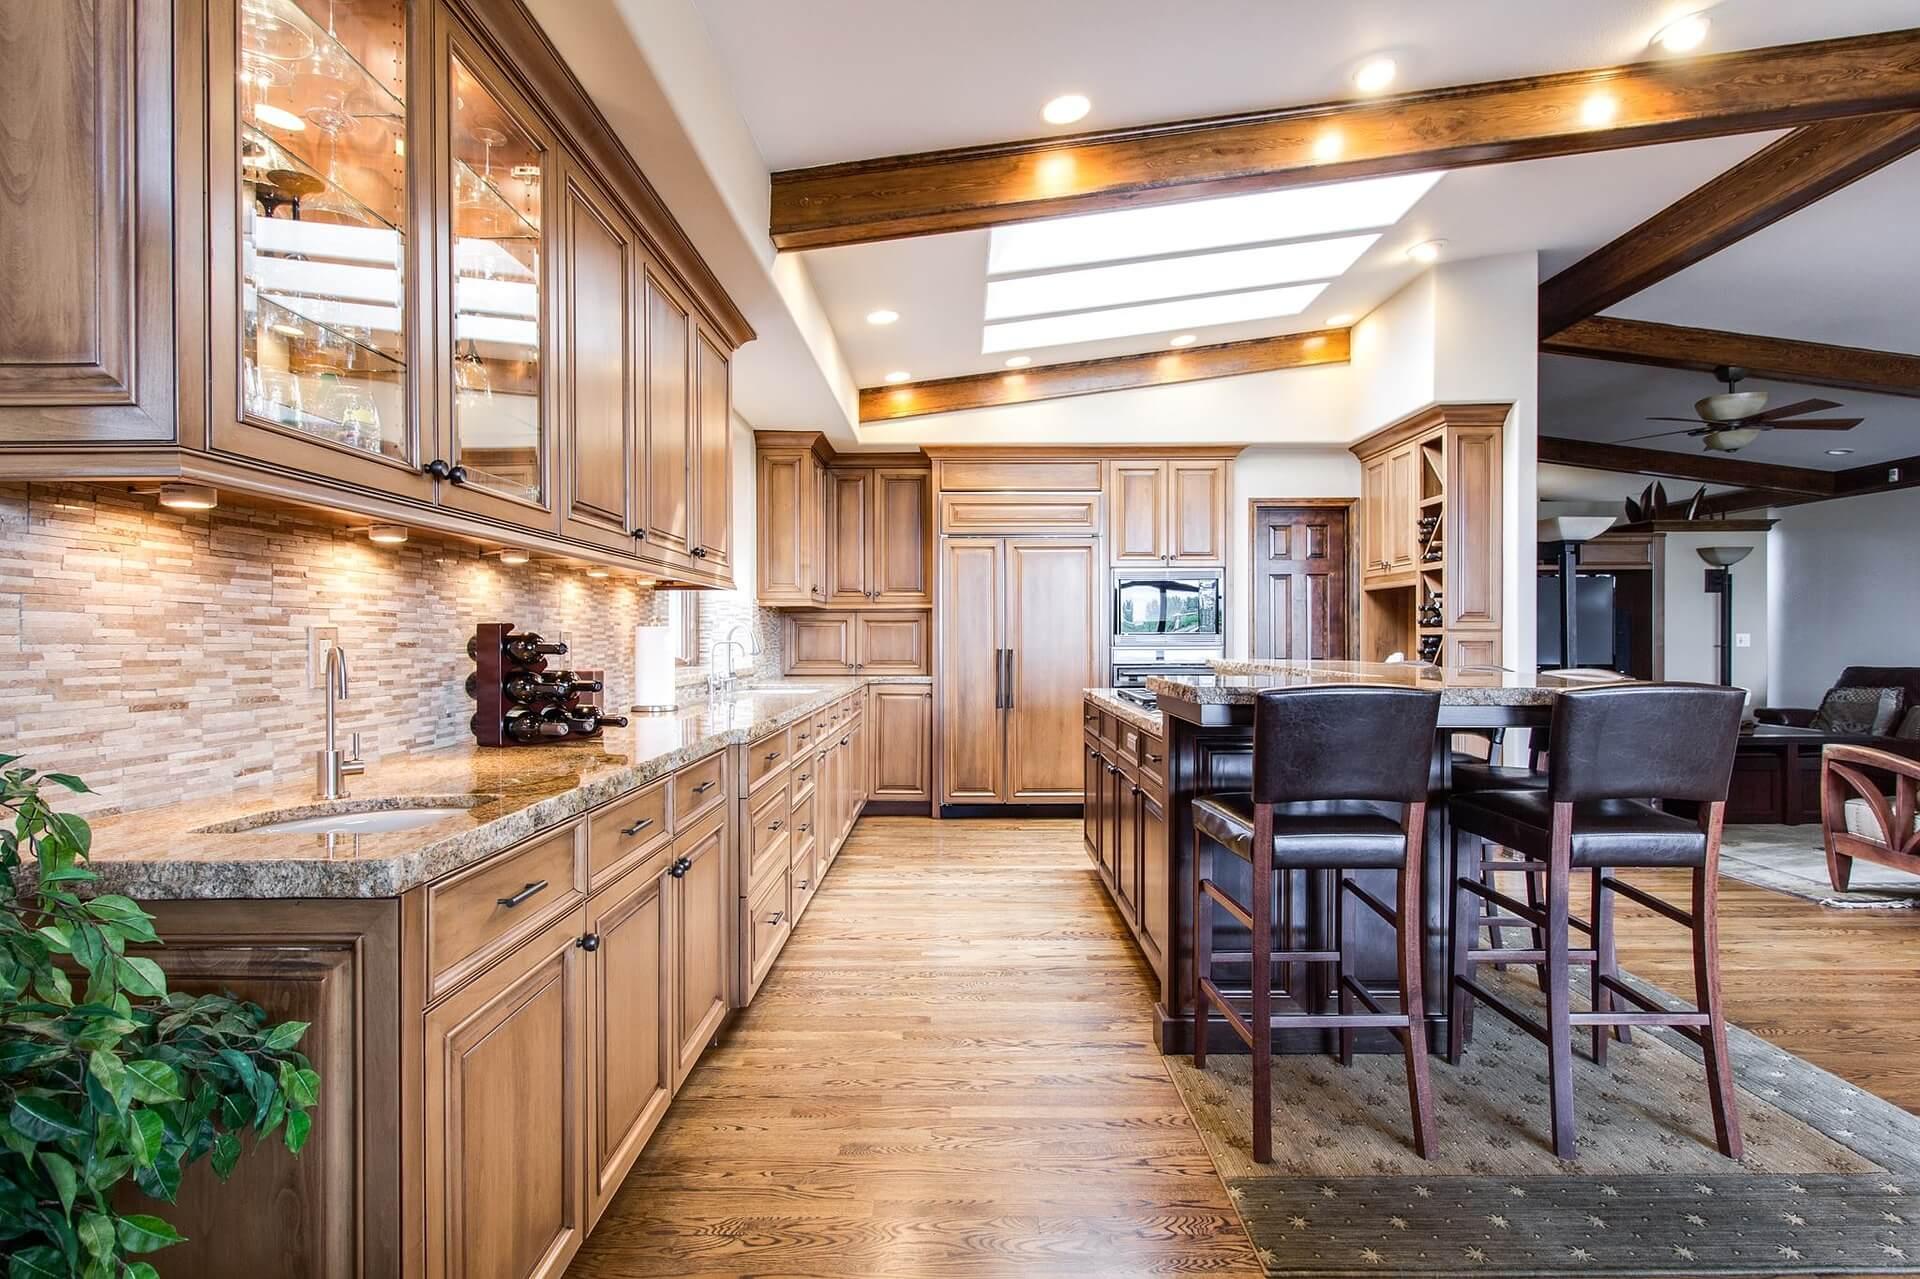 55-SoFlo Kitchen Remodeling & Custom Cabinet Installation - backsplashes, flooring, countertops